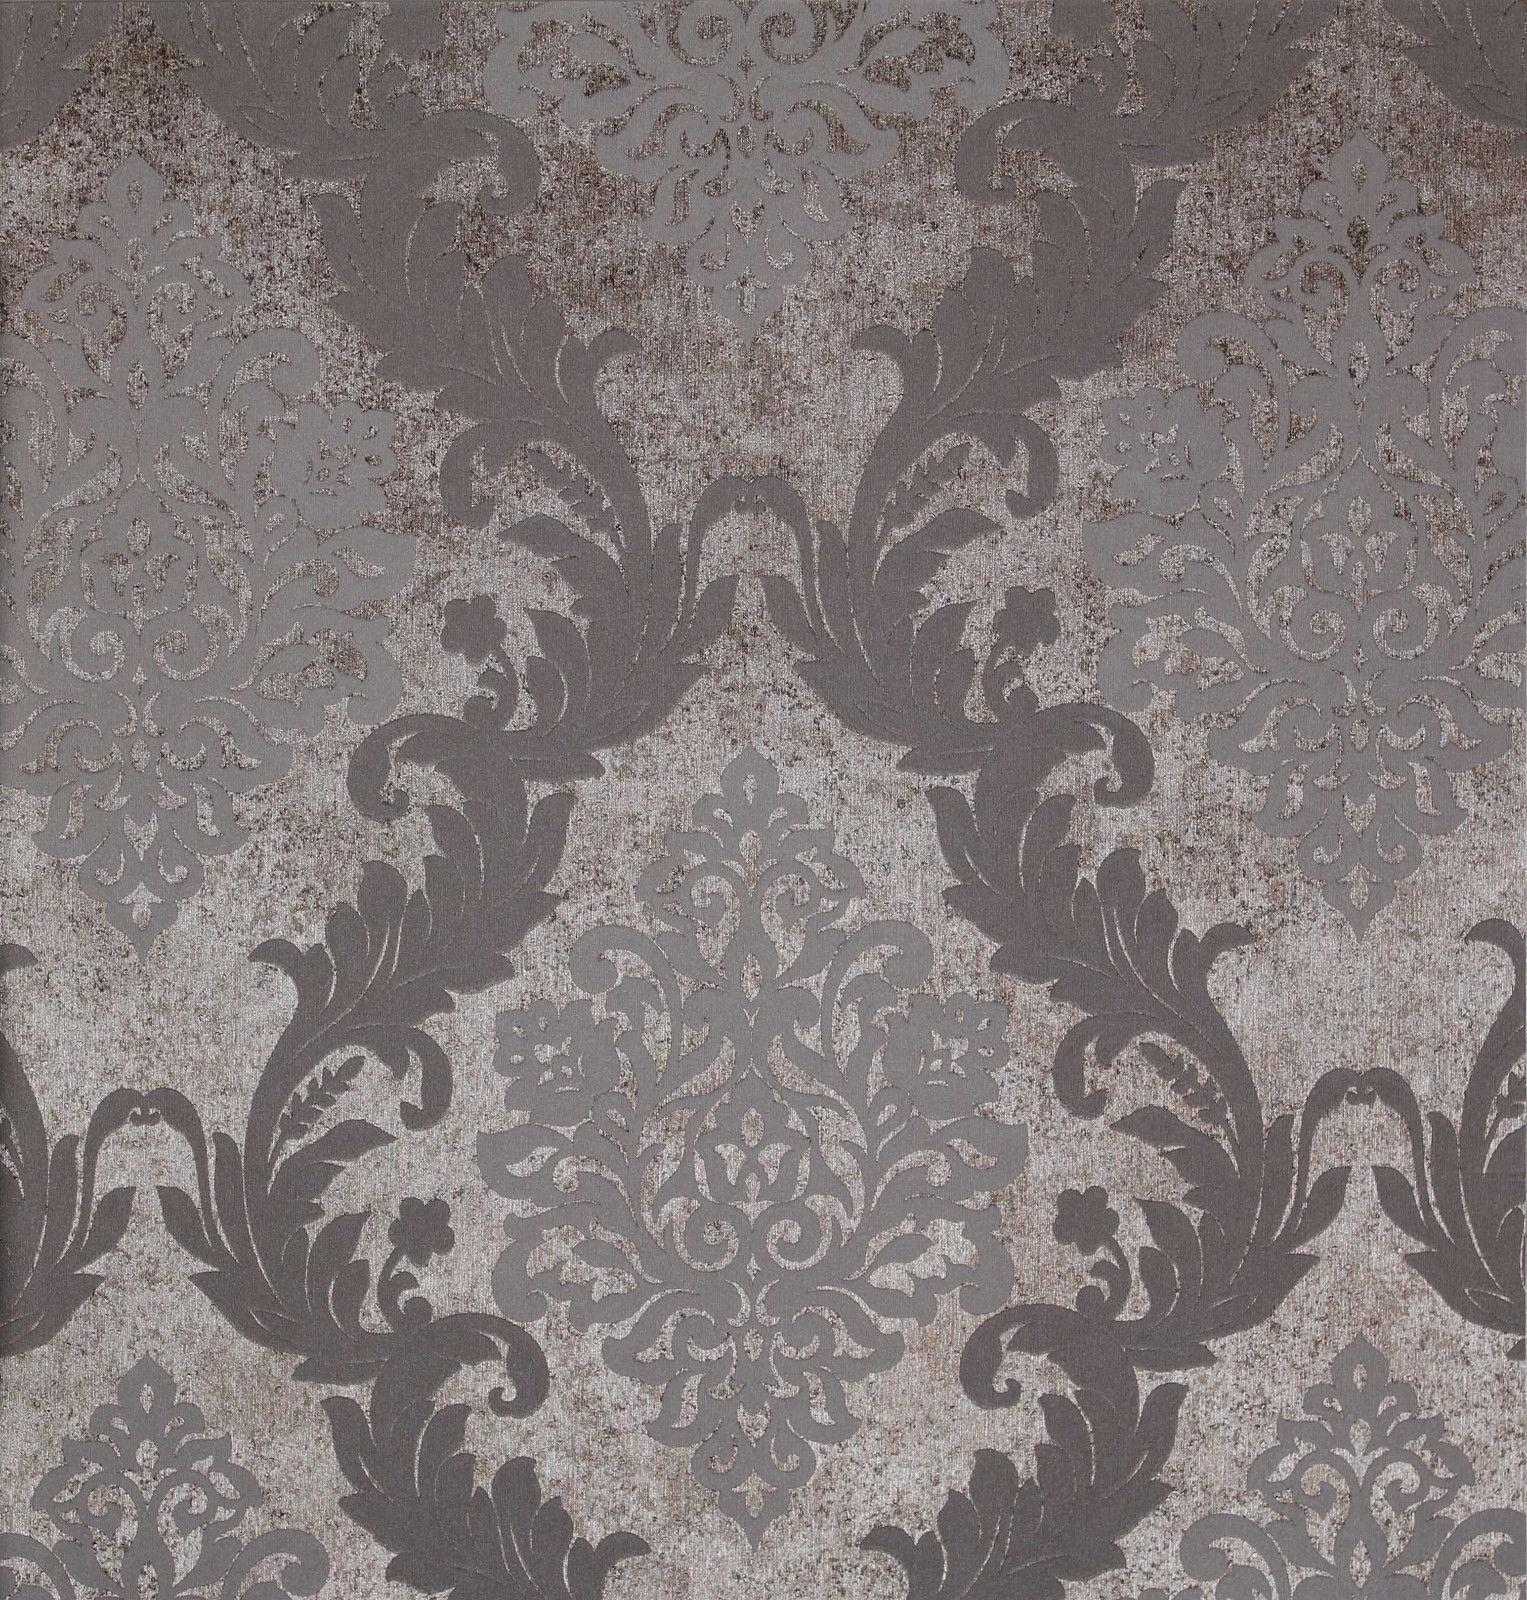 Grey Silver Damask Embossed Texture Background Vinyl Wallpaper eBay 1527x1600